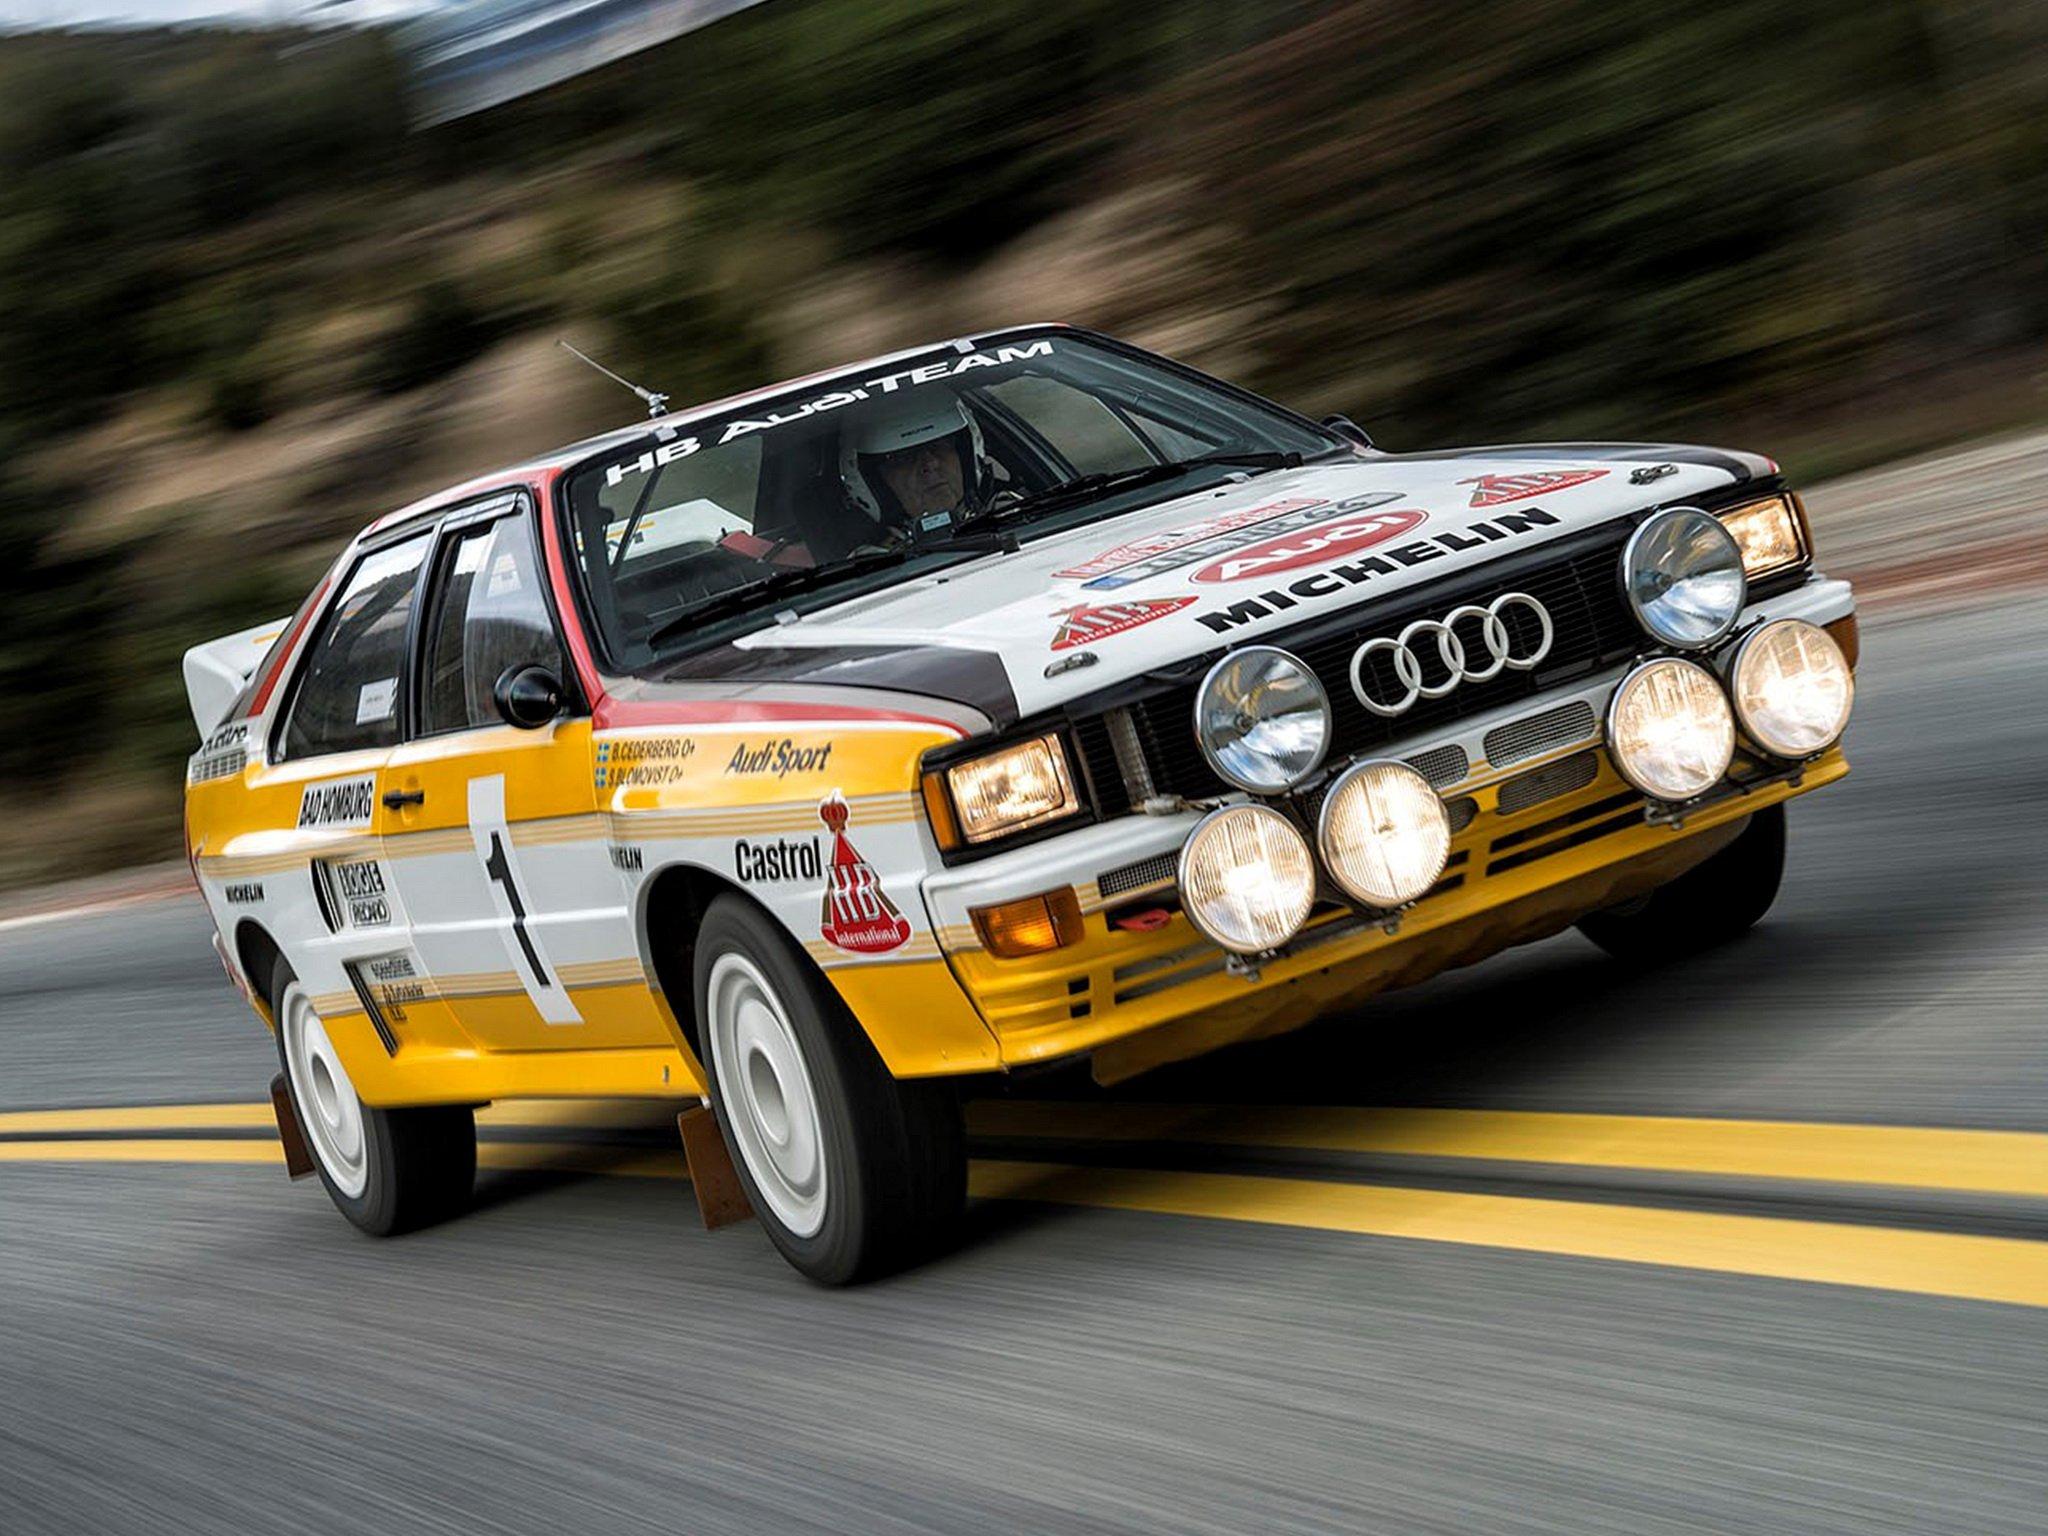 1983 85 Audi Quattro Group B Rally Car Typ 85 Wrc Race